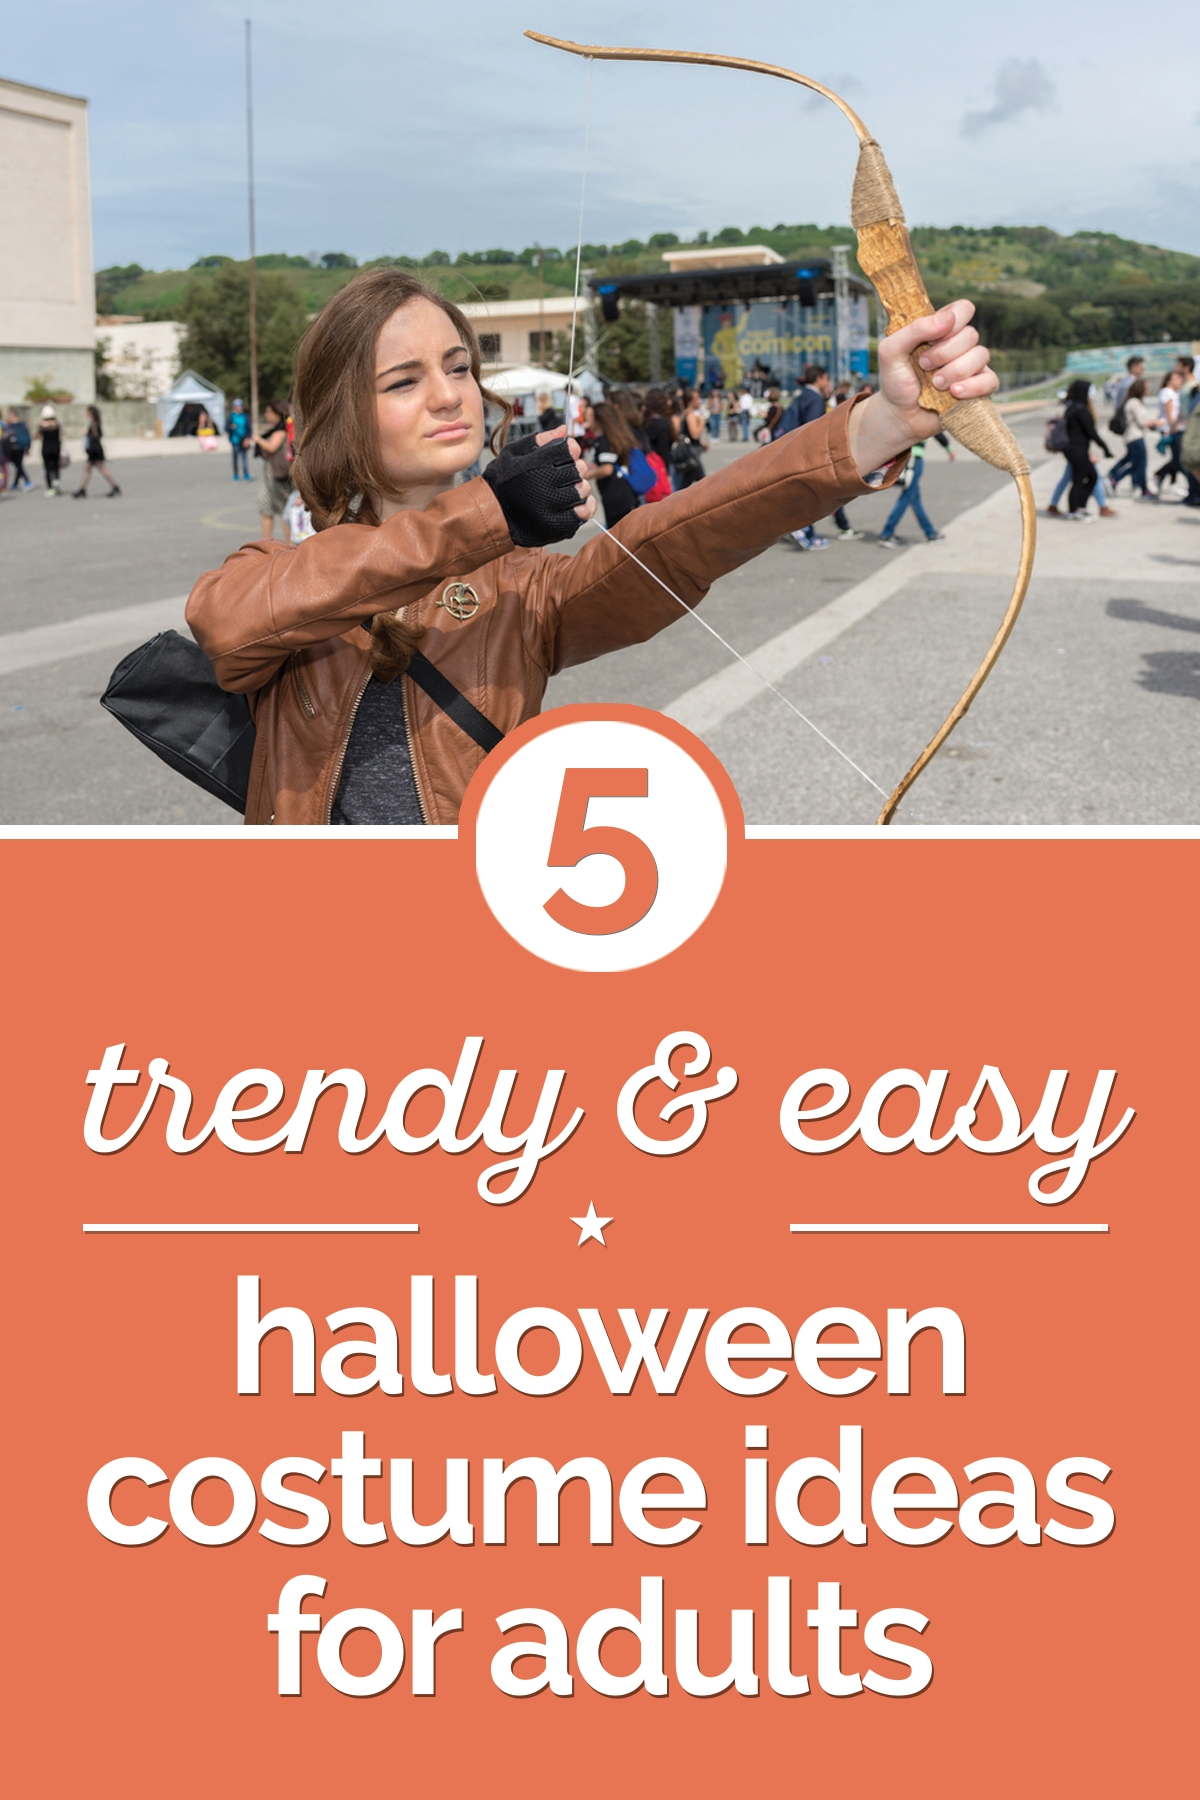 10 Stylish Adult Easy Halloween Costume Ideas 5 trendy easy halloween costume ideas for adults thegoodstuff 2020